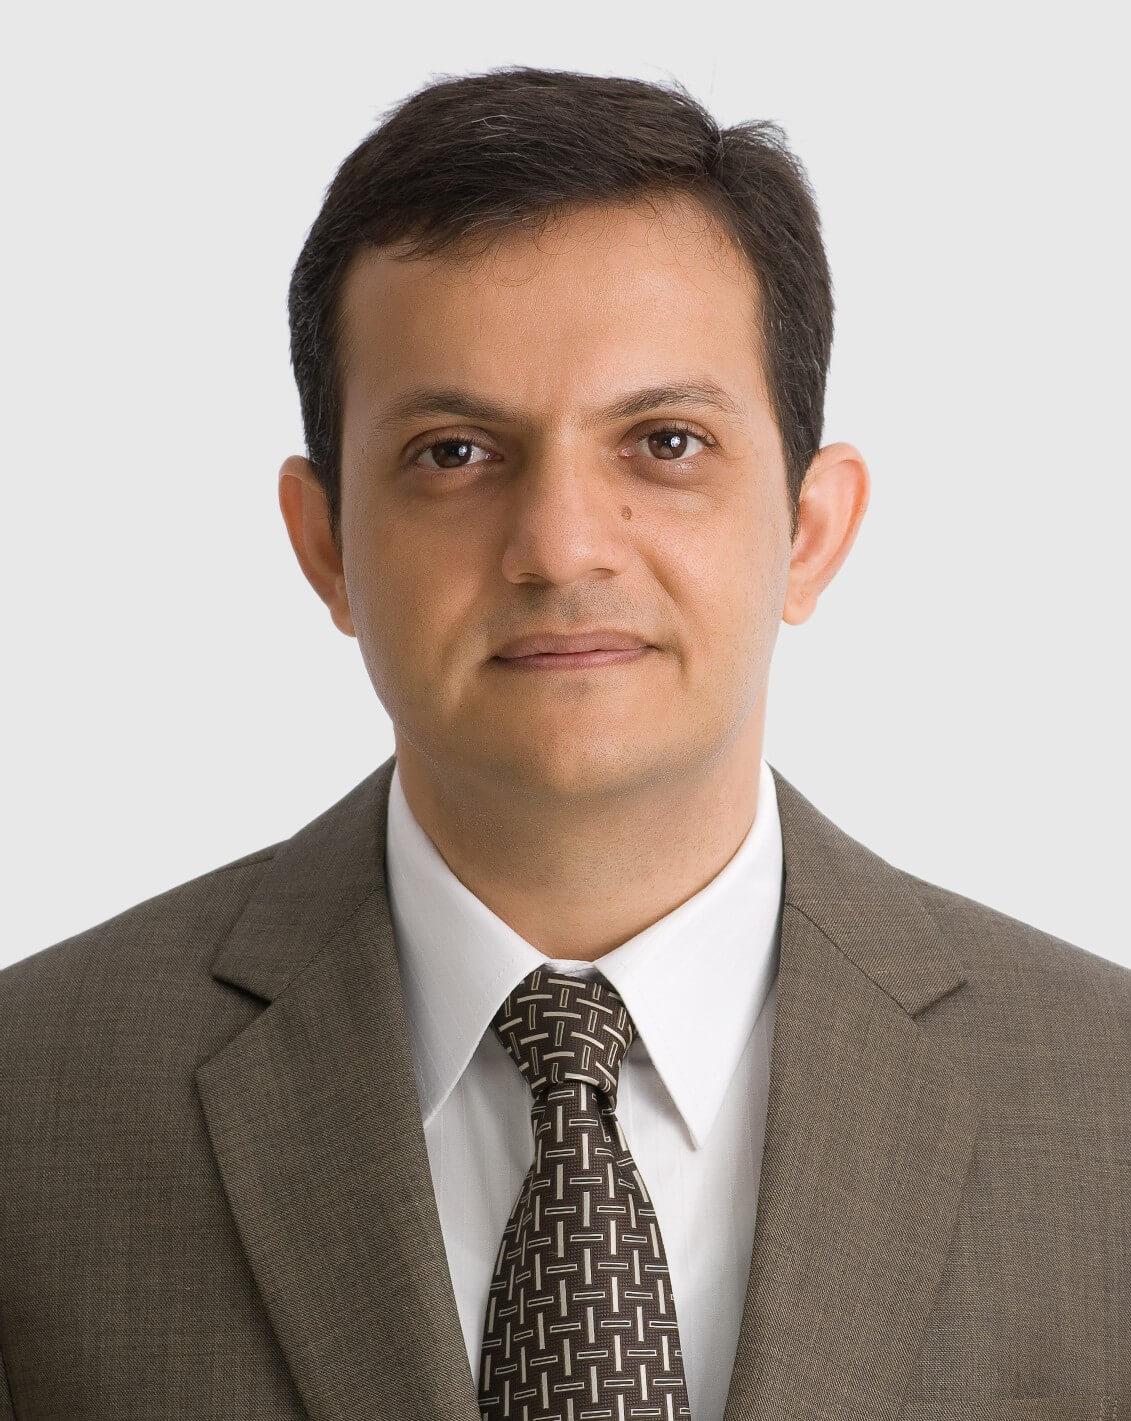 Manish Anandani